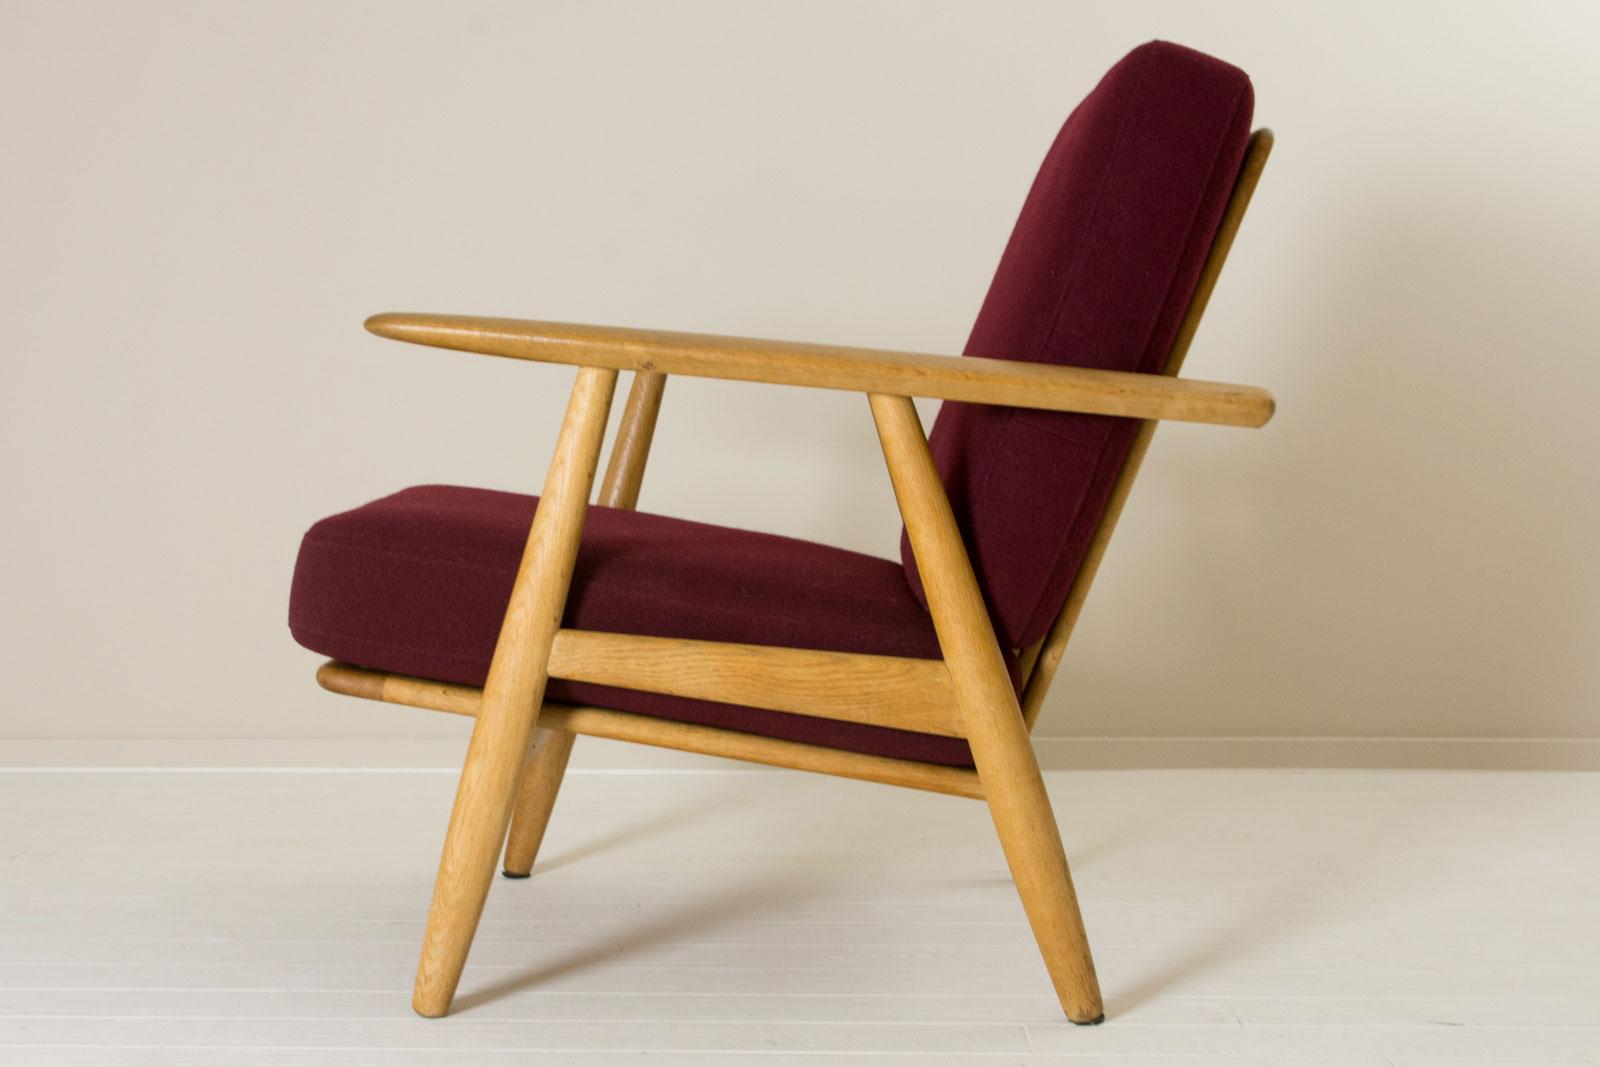 GE240 Easy Chair by Hans J Wegner